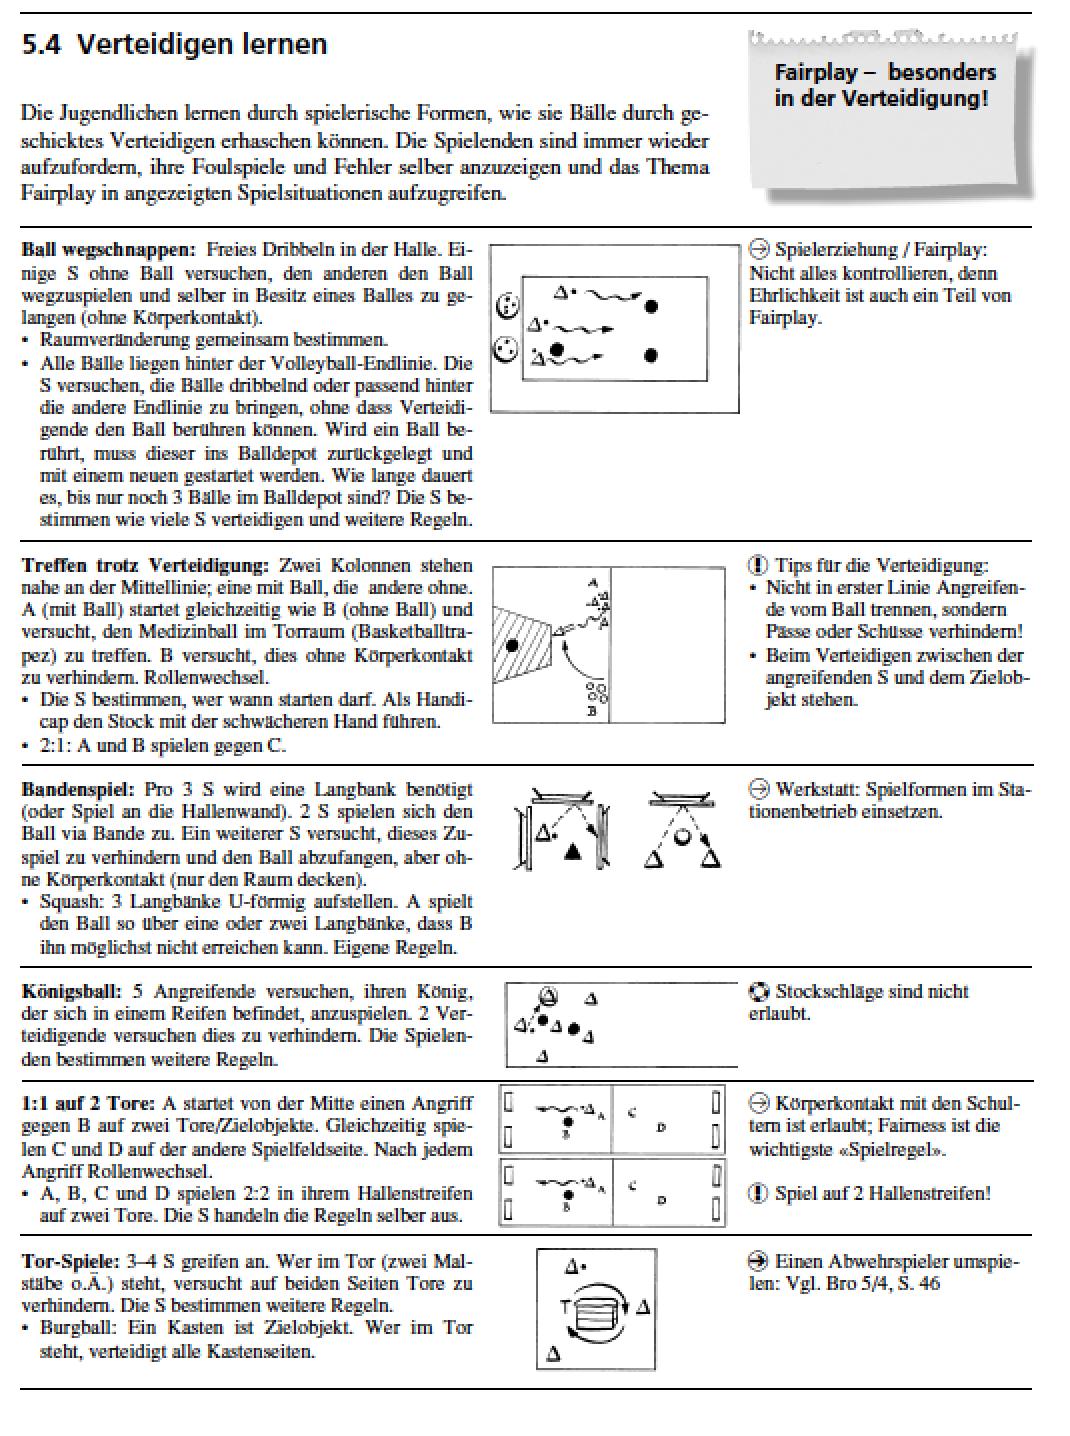 Preview image for LOM object Unihockey - Verteidigen lernen